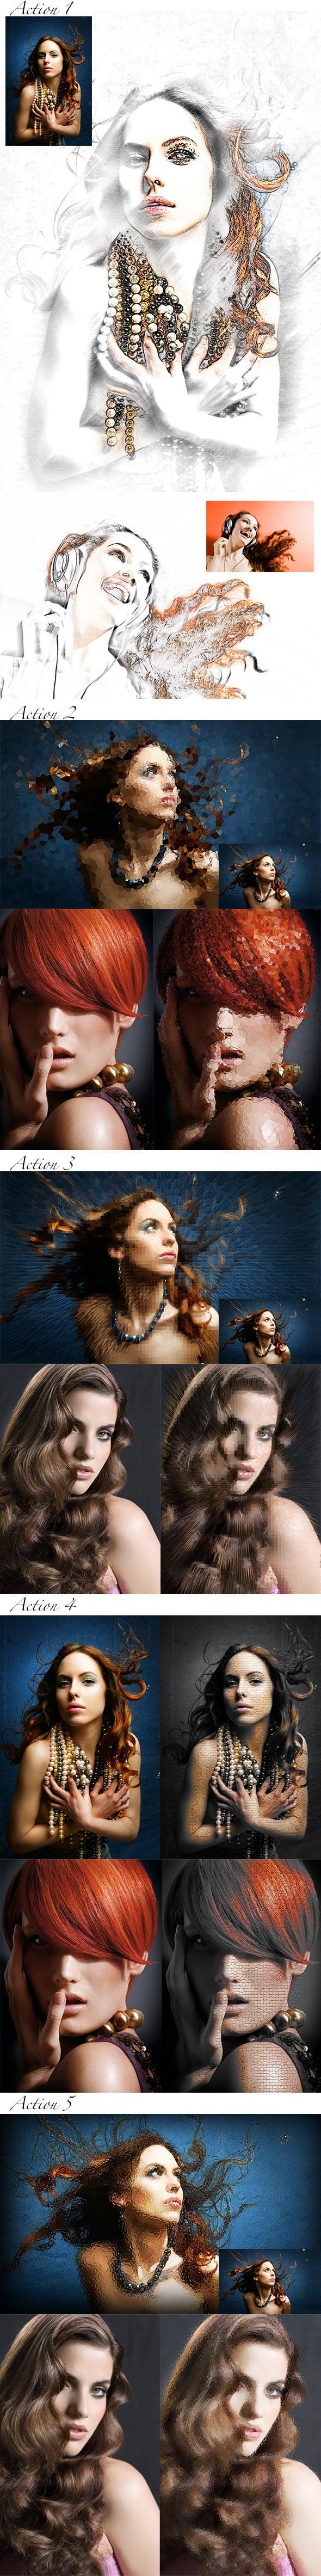 63 VSCO Photoshop Actions: Artistic Actions Bundle - just $9 - 6 2